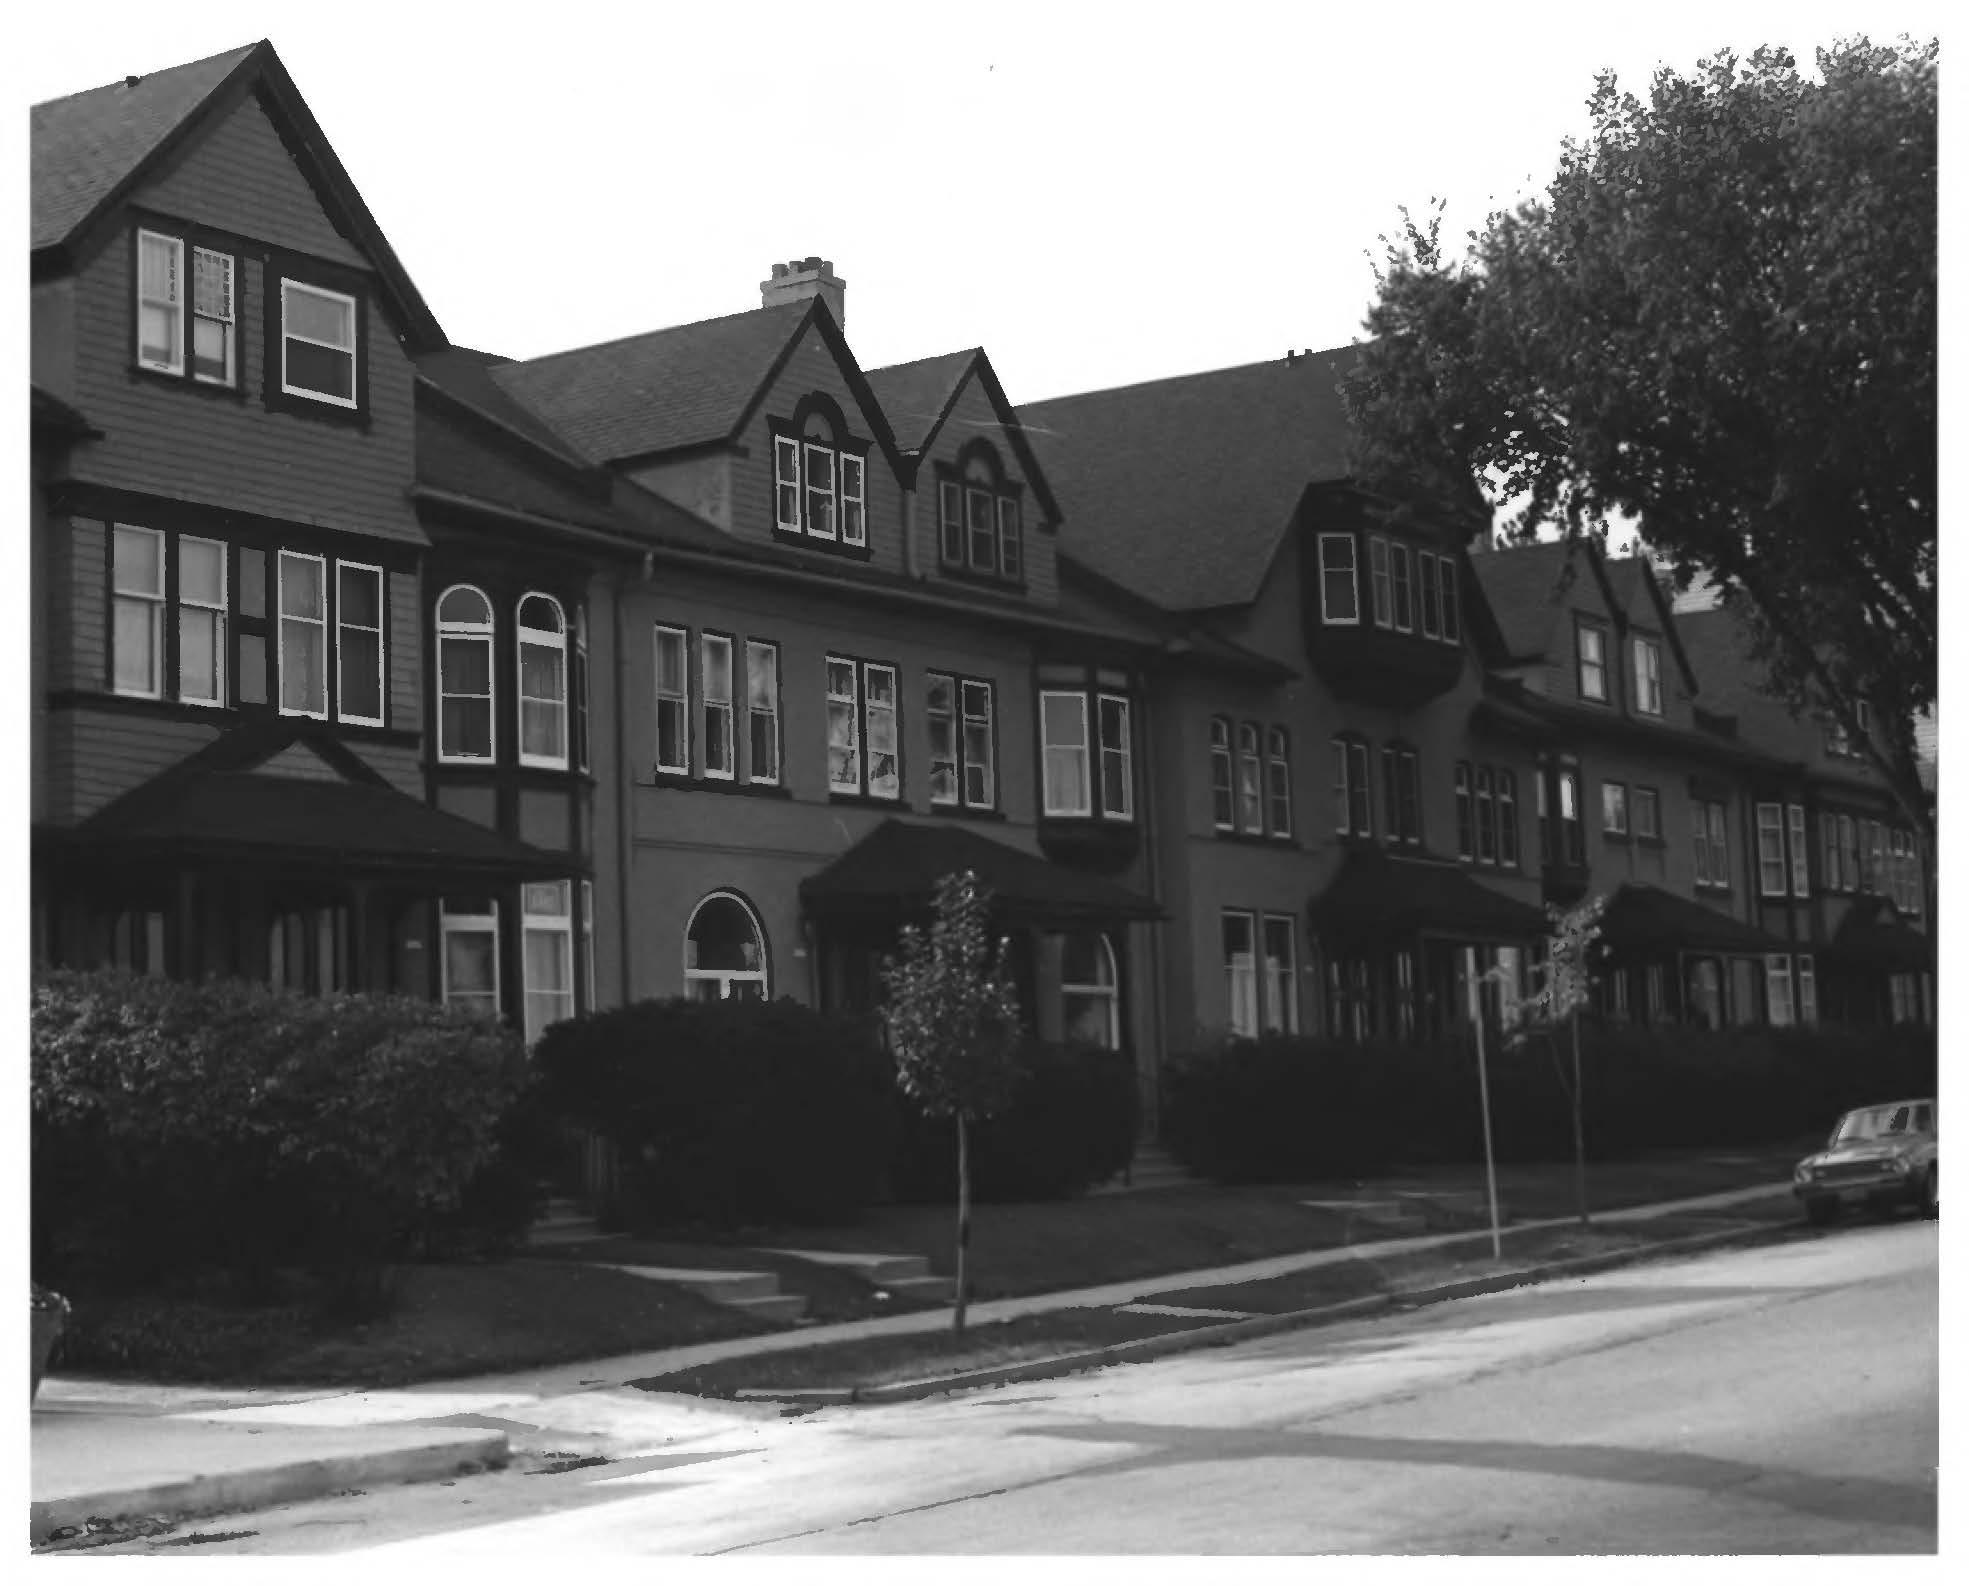 Abbot Row, 1982